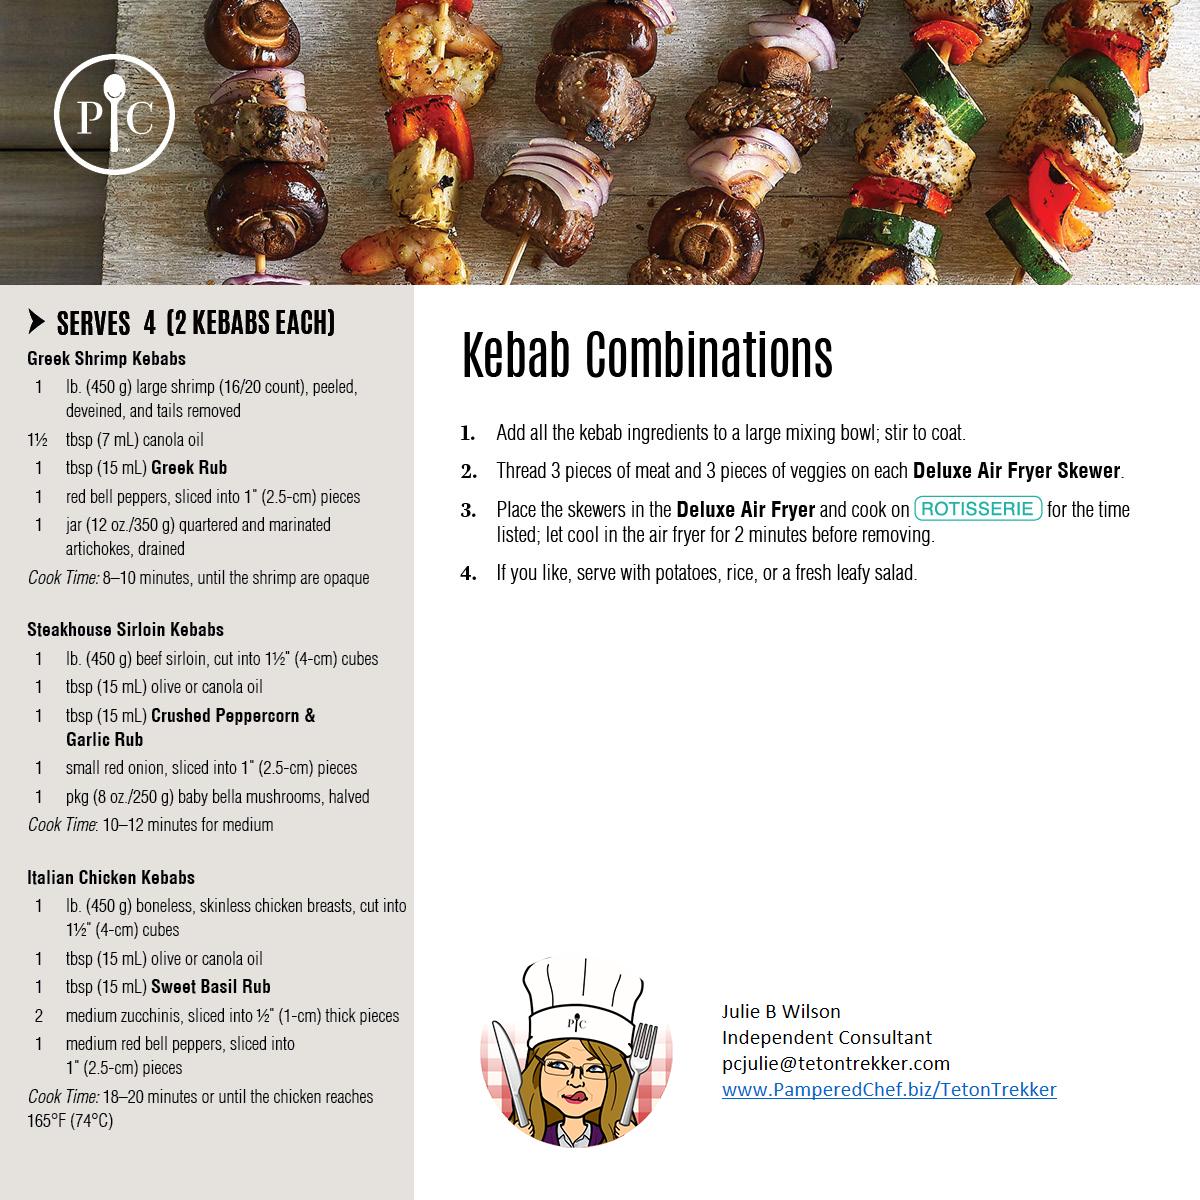 Kebab Combinations